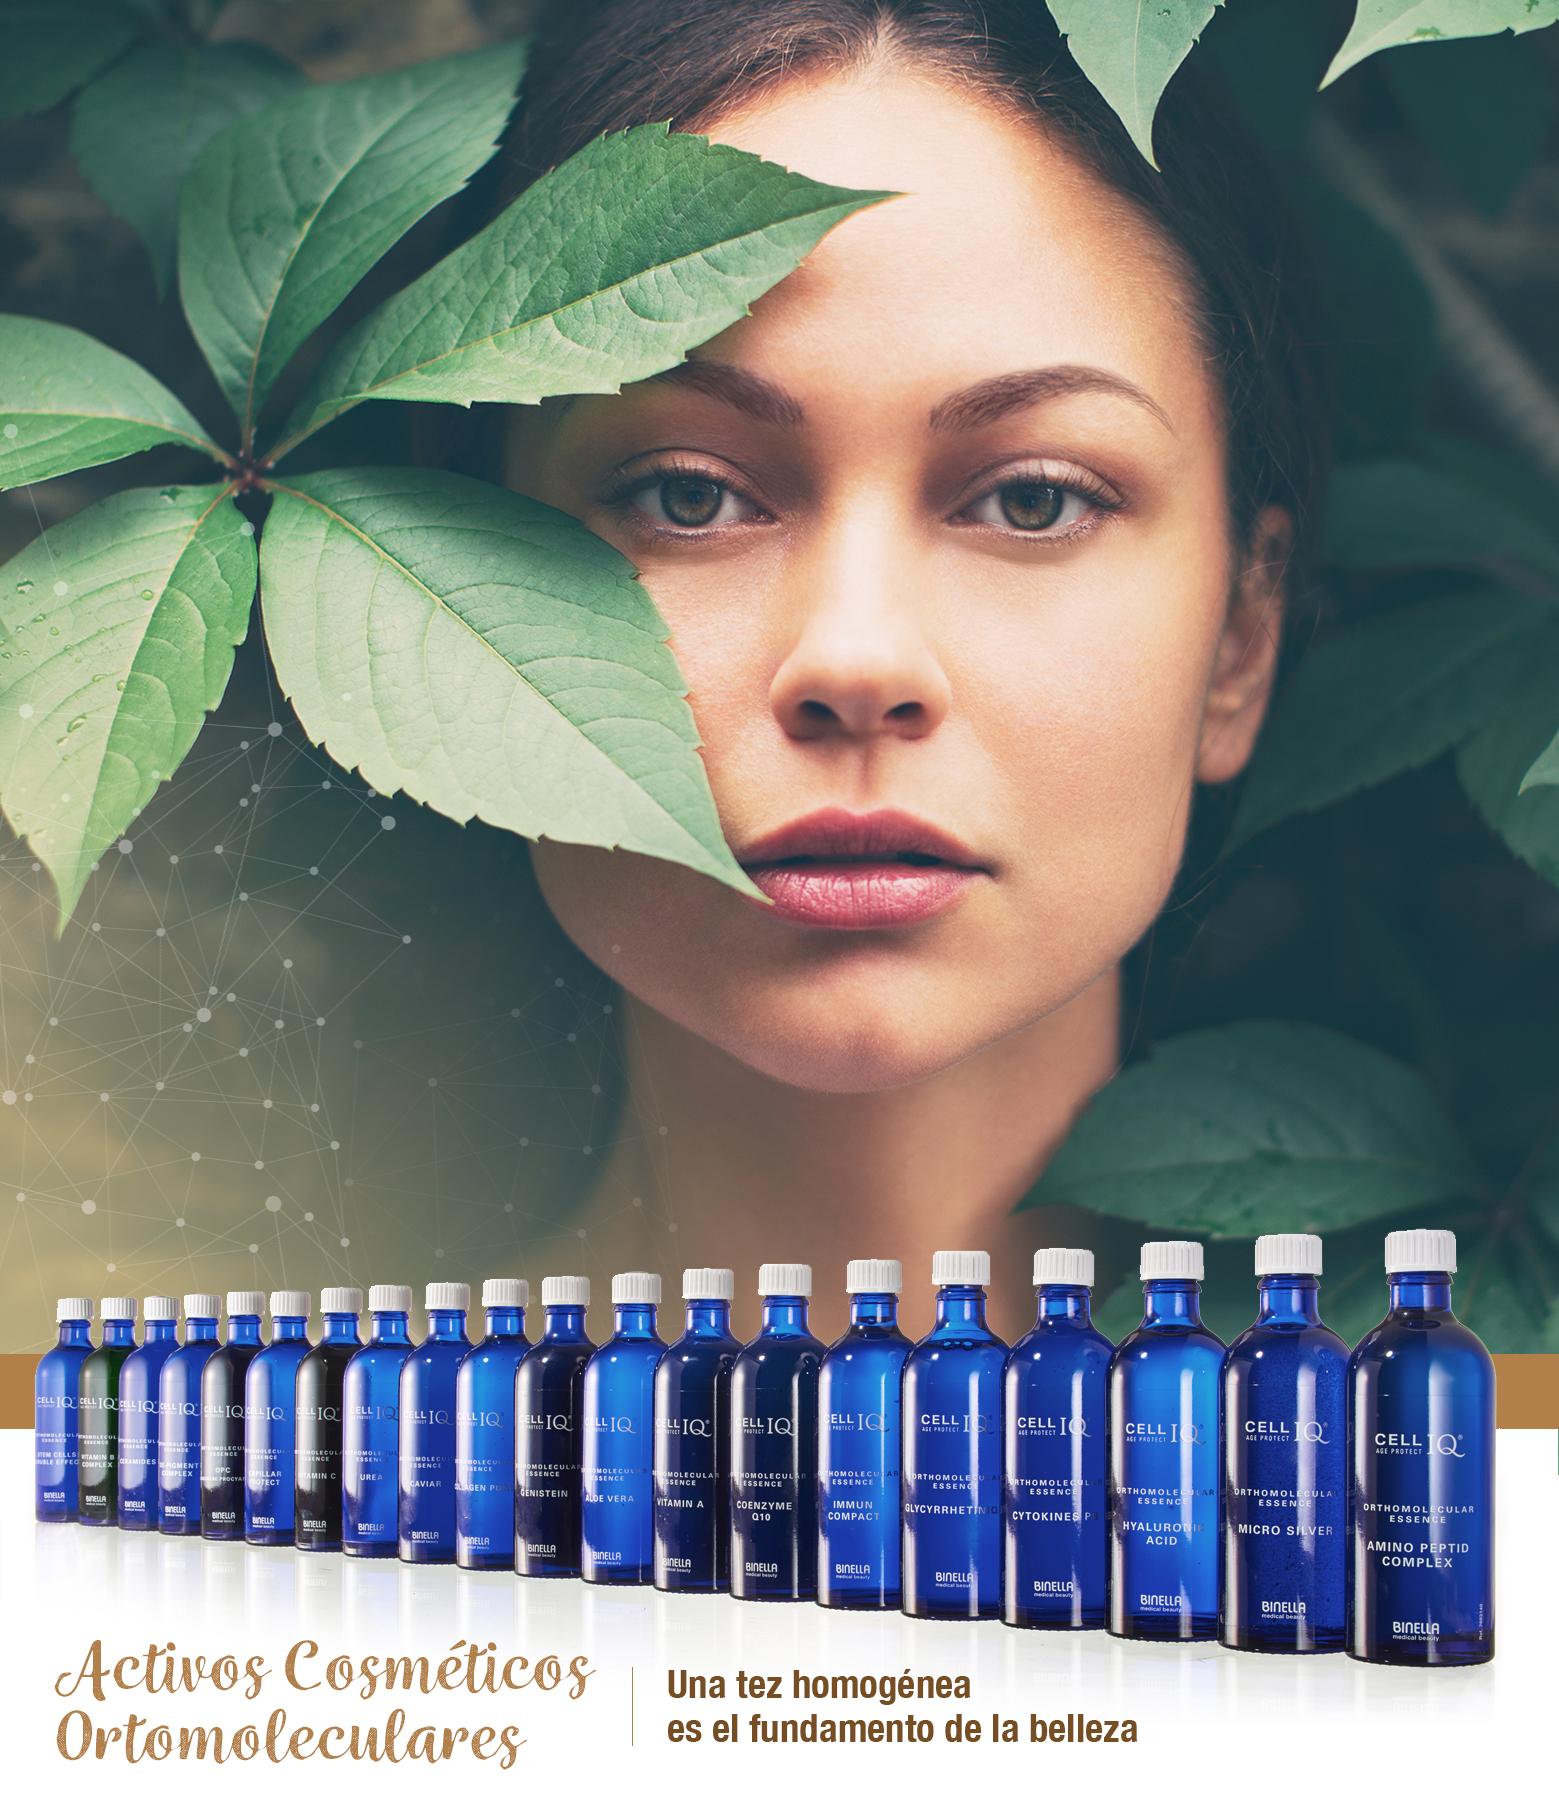 Cell IQ activos cosméticos ortomoleculares belium medical gijon piel rejuvenecimiento belleza natural